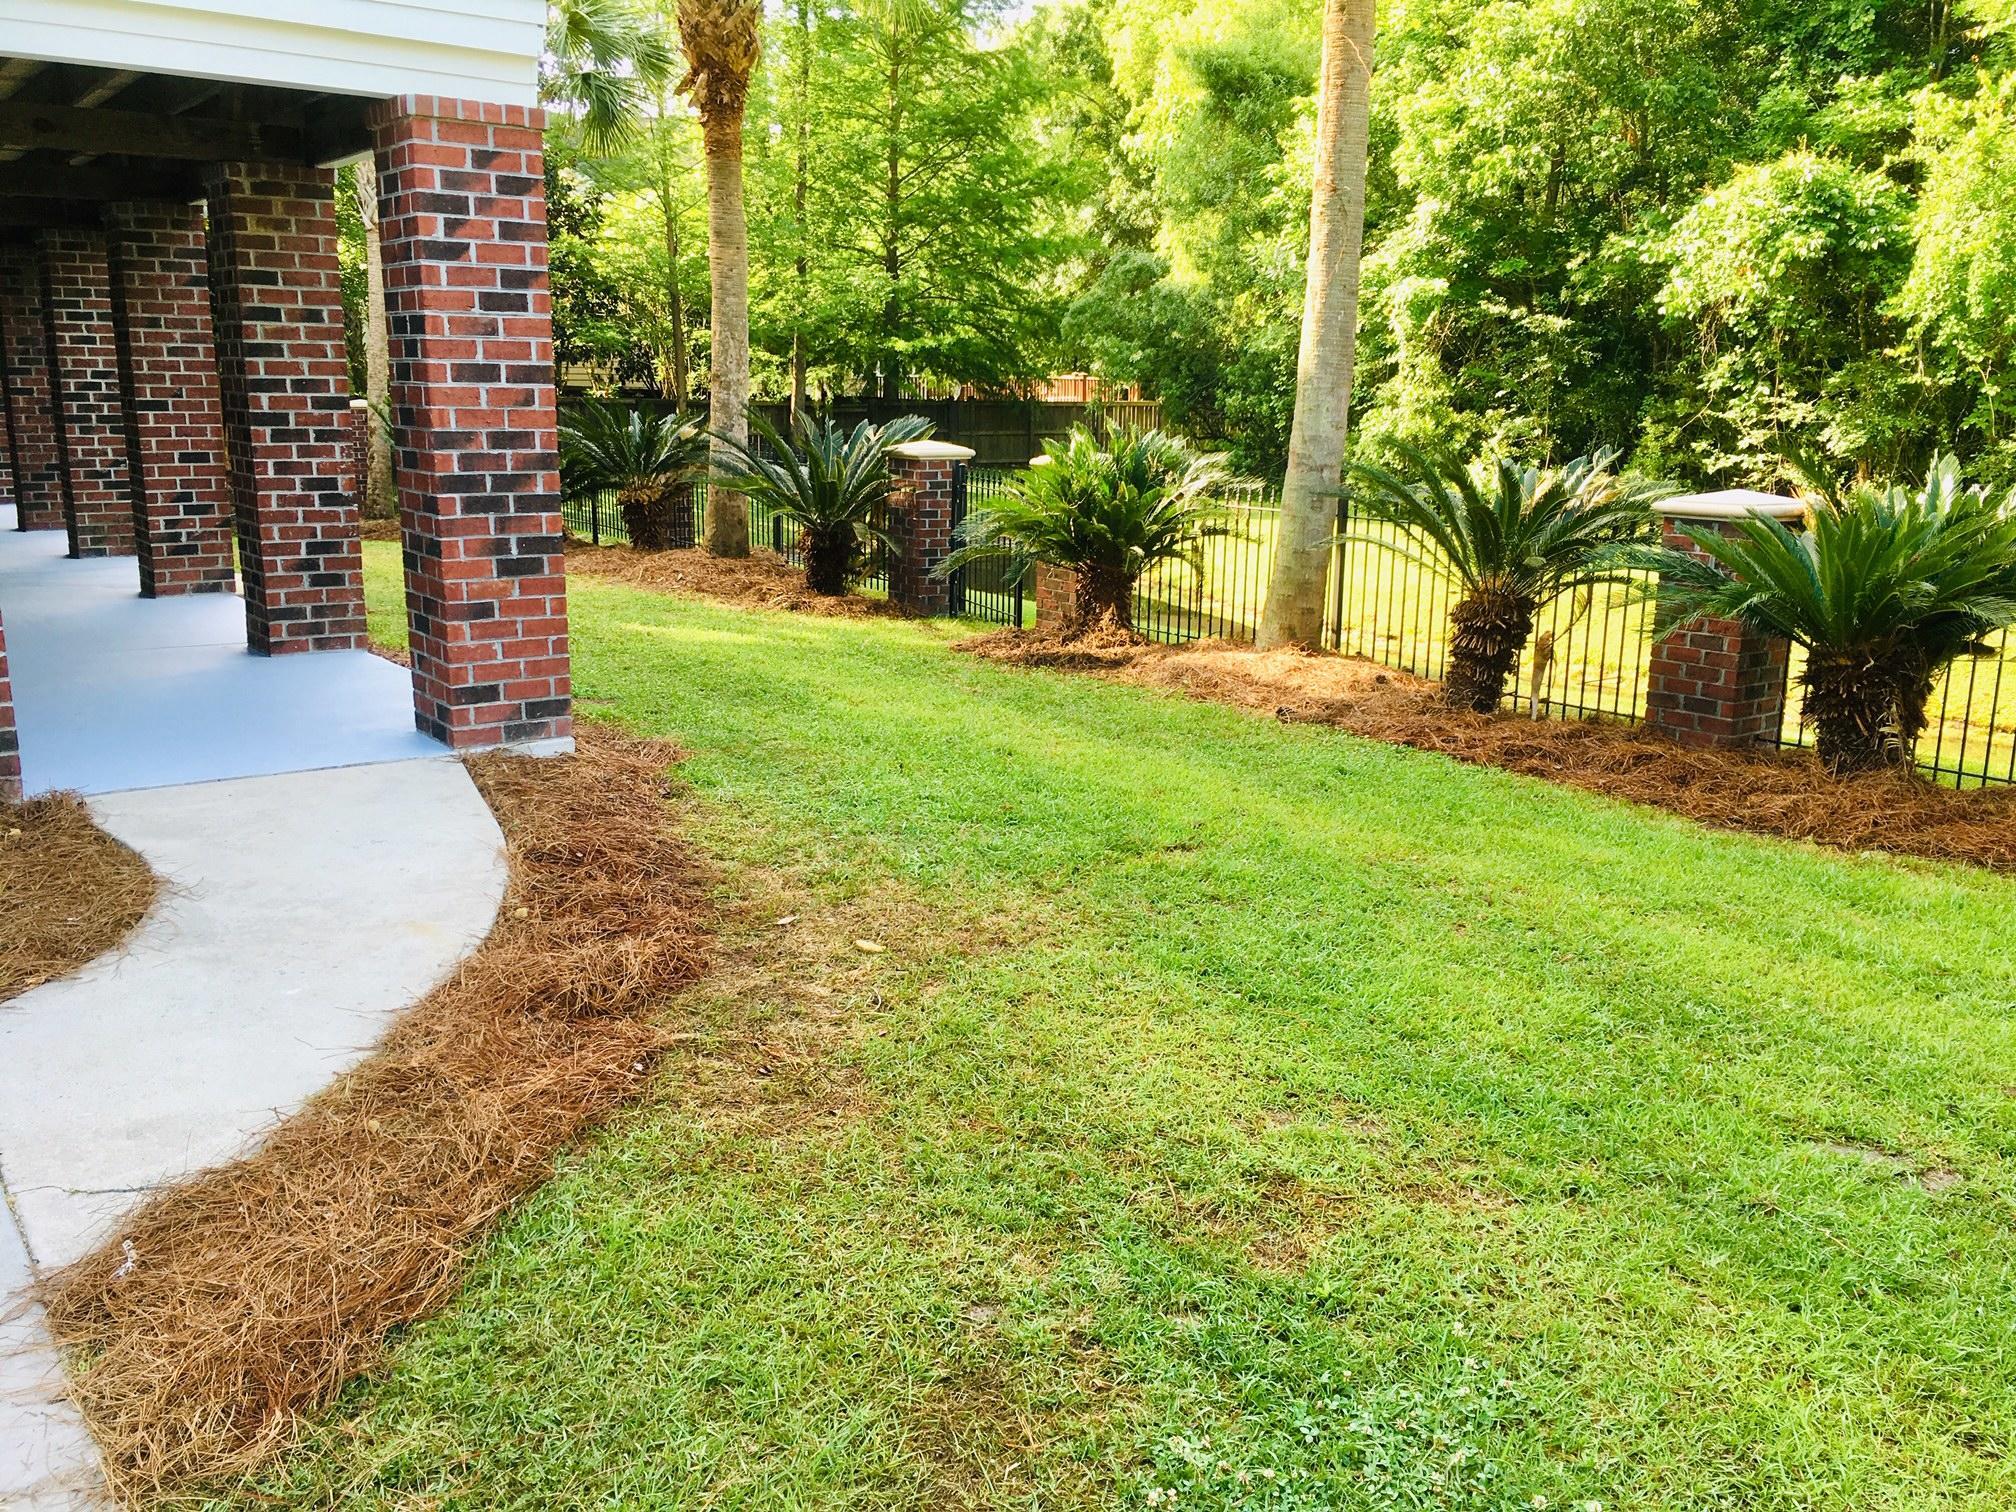 Hunt Club Homes For Sale - 1413 Gator Track, Charleston, SC - 11